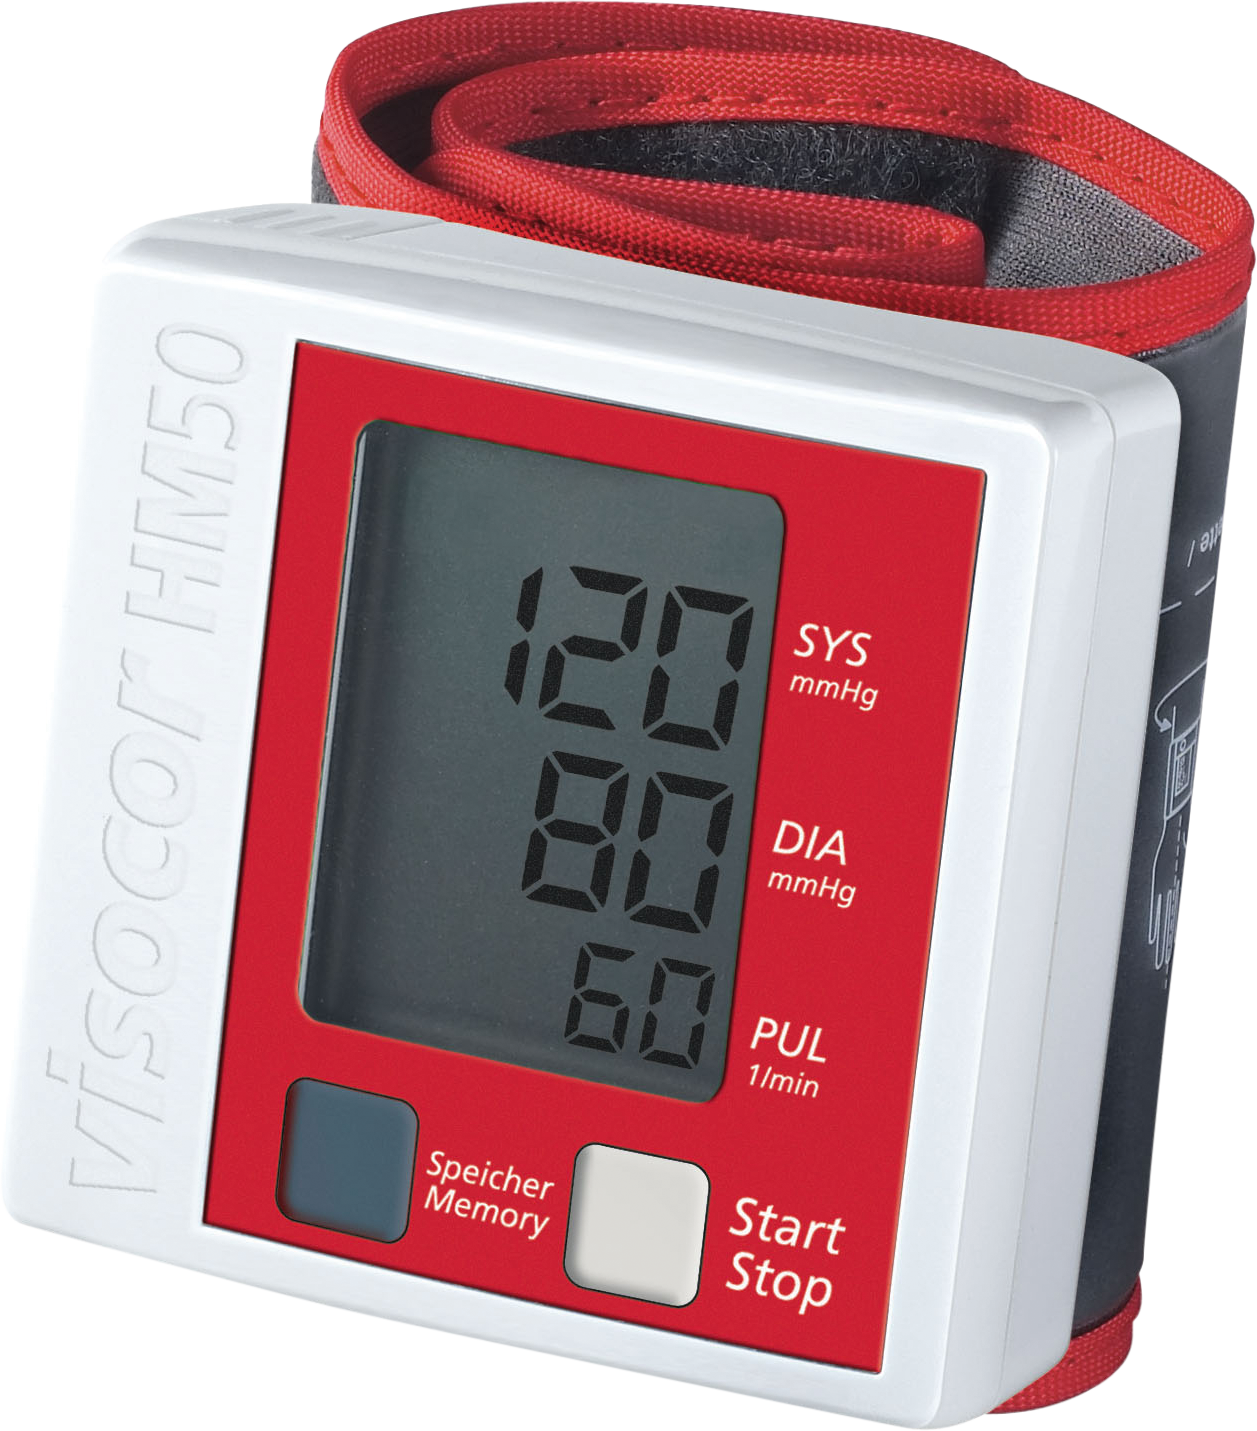 visocor HM50 Handgelenk-Blutdruckmessgerät